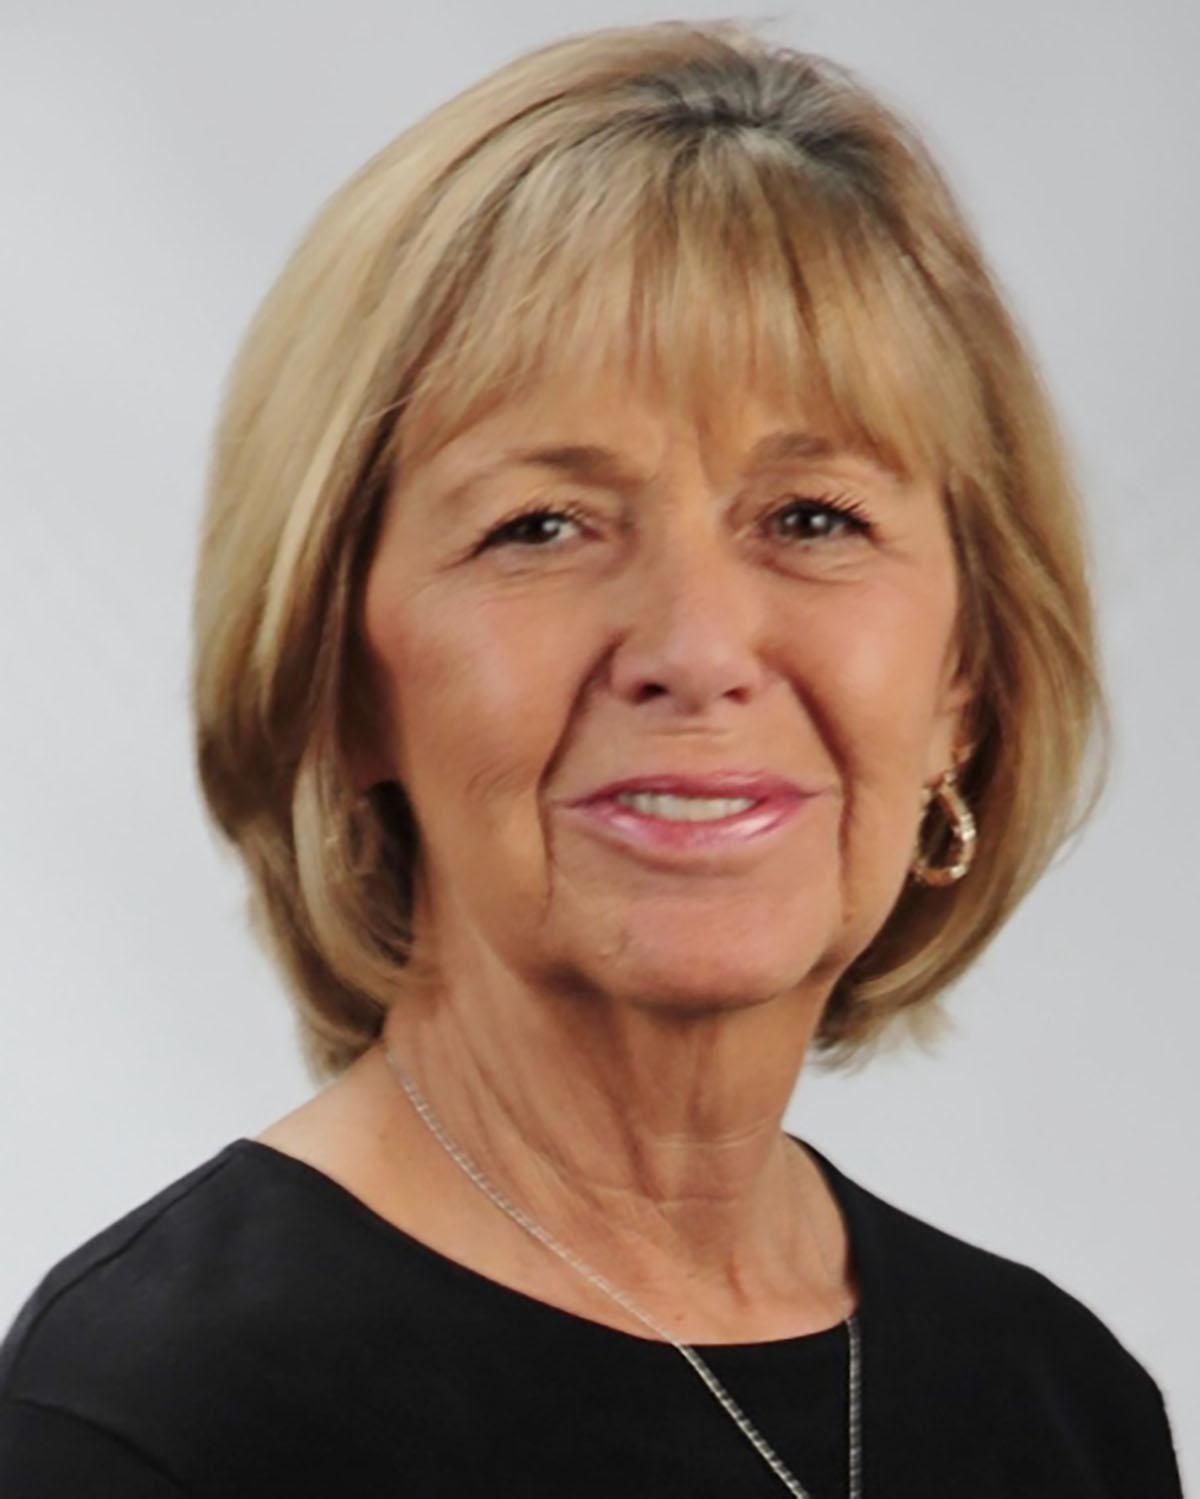 Sharon Finlinson